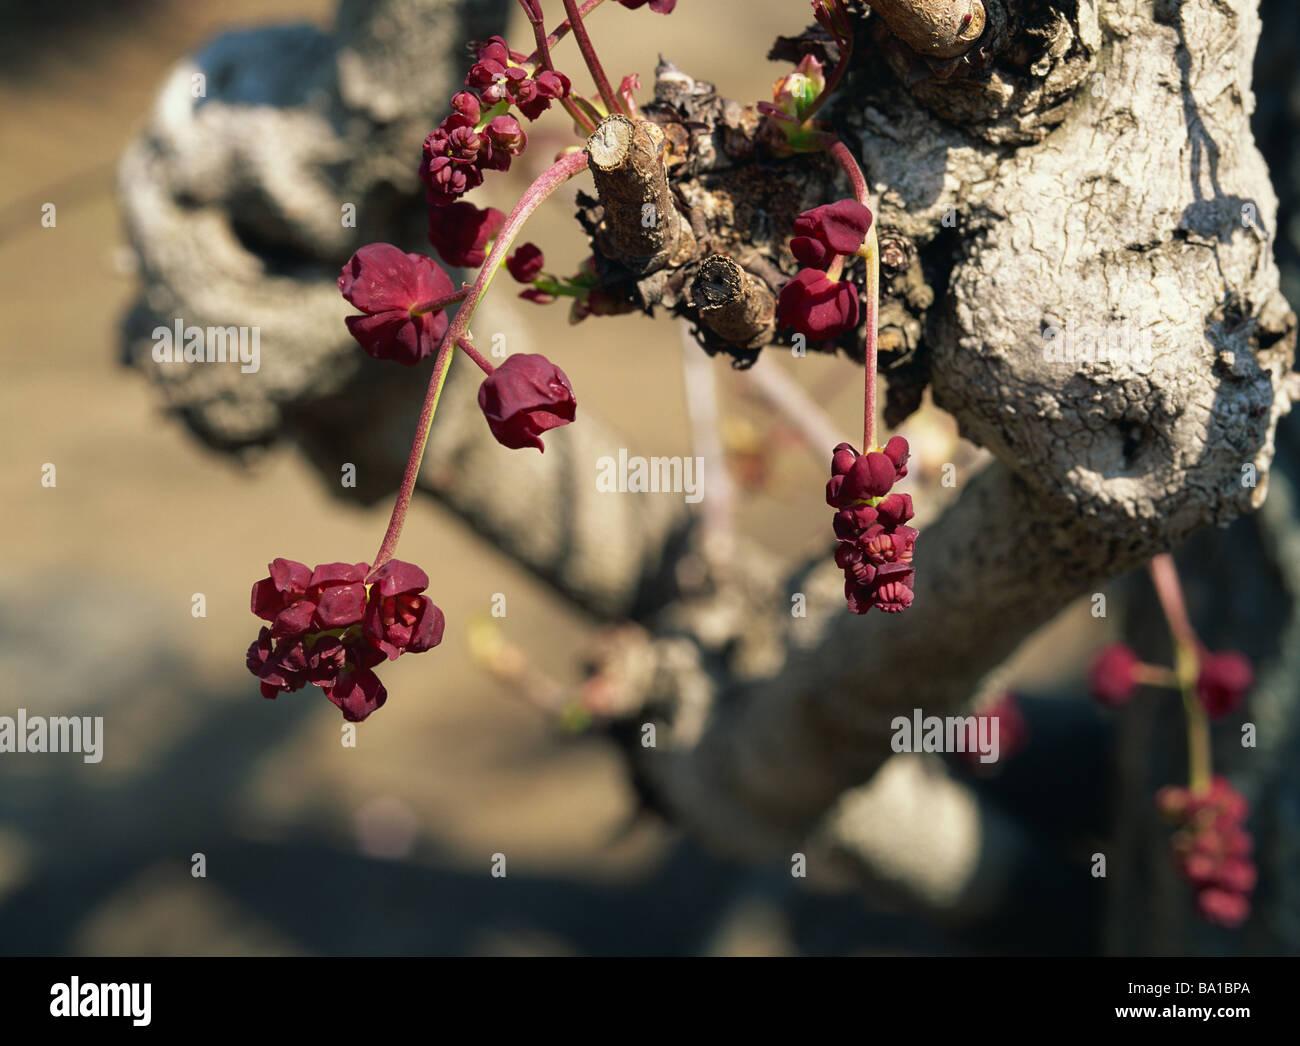 Chocolate Vine Flowers Growing on Tree Stock Photo, Royalty Free ...